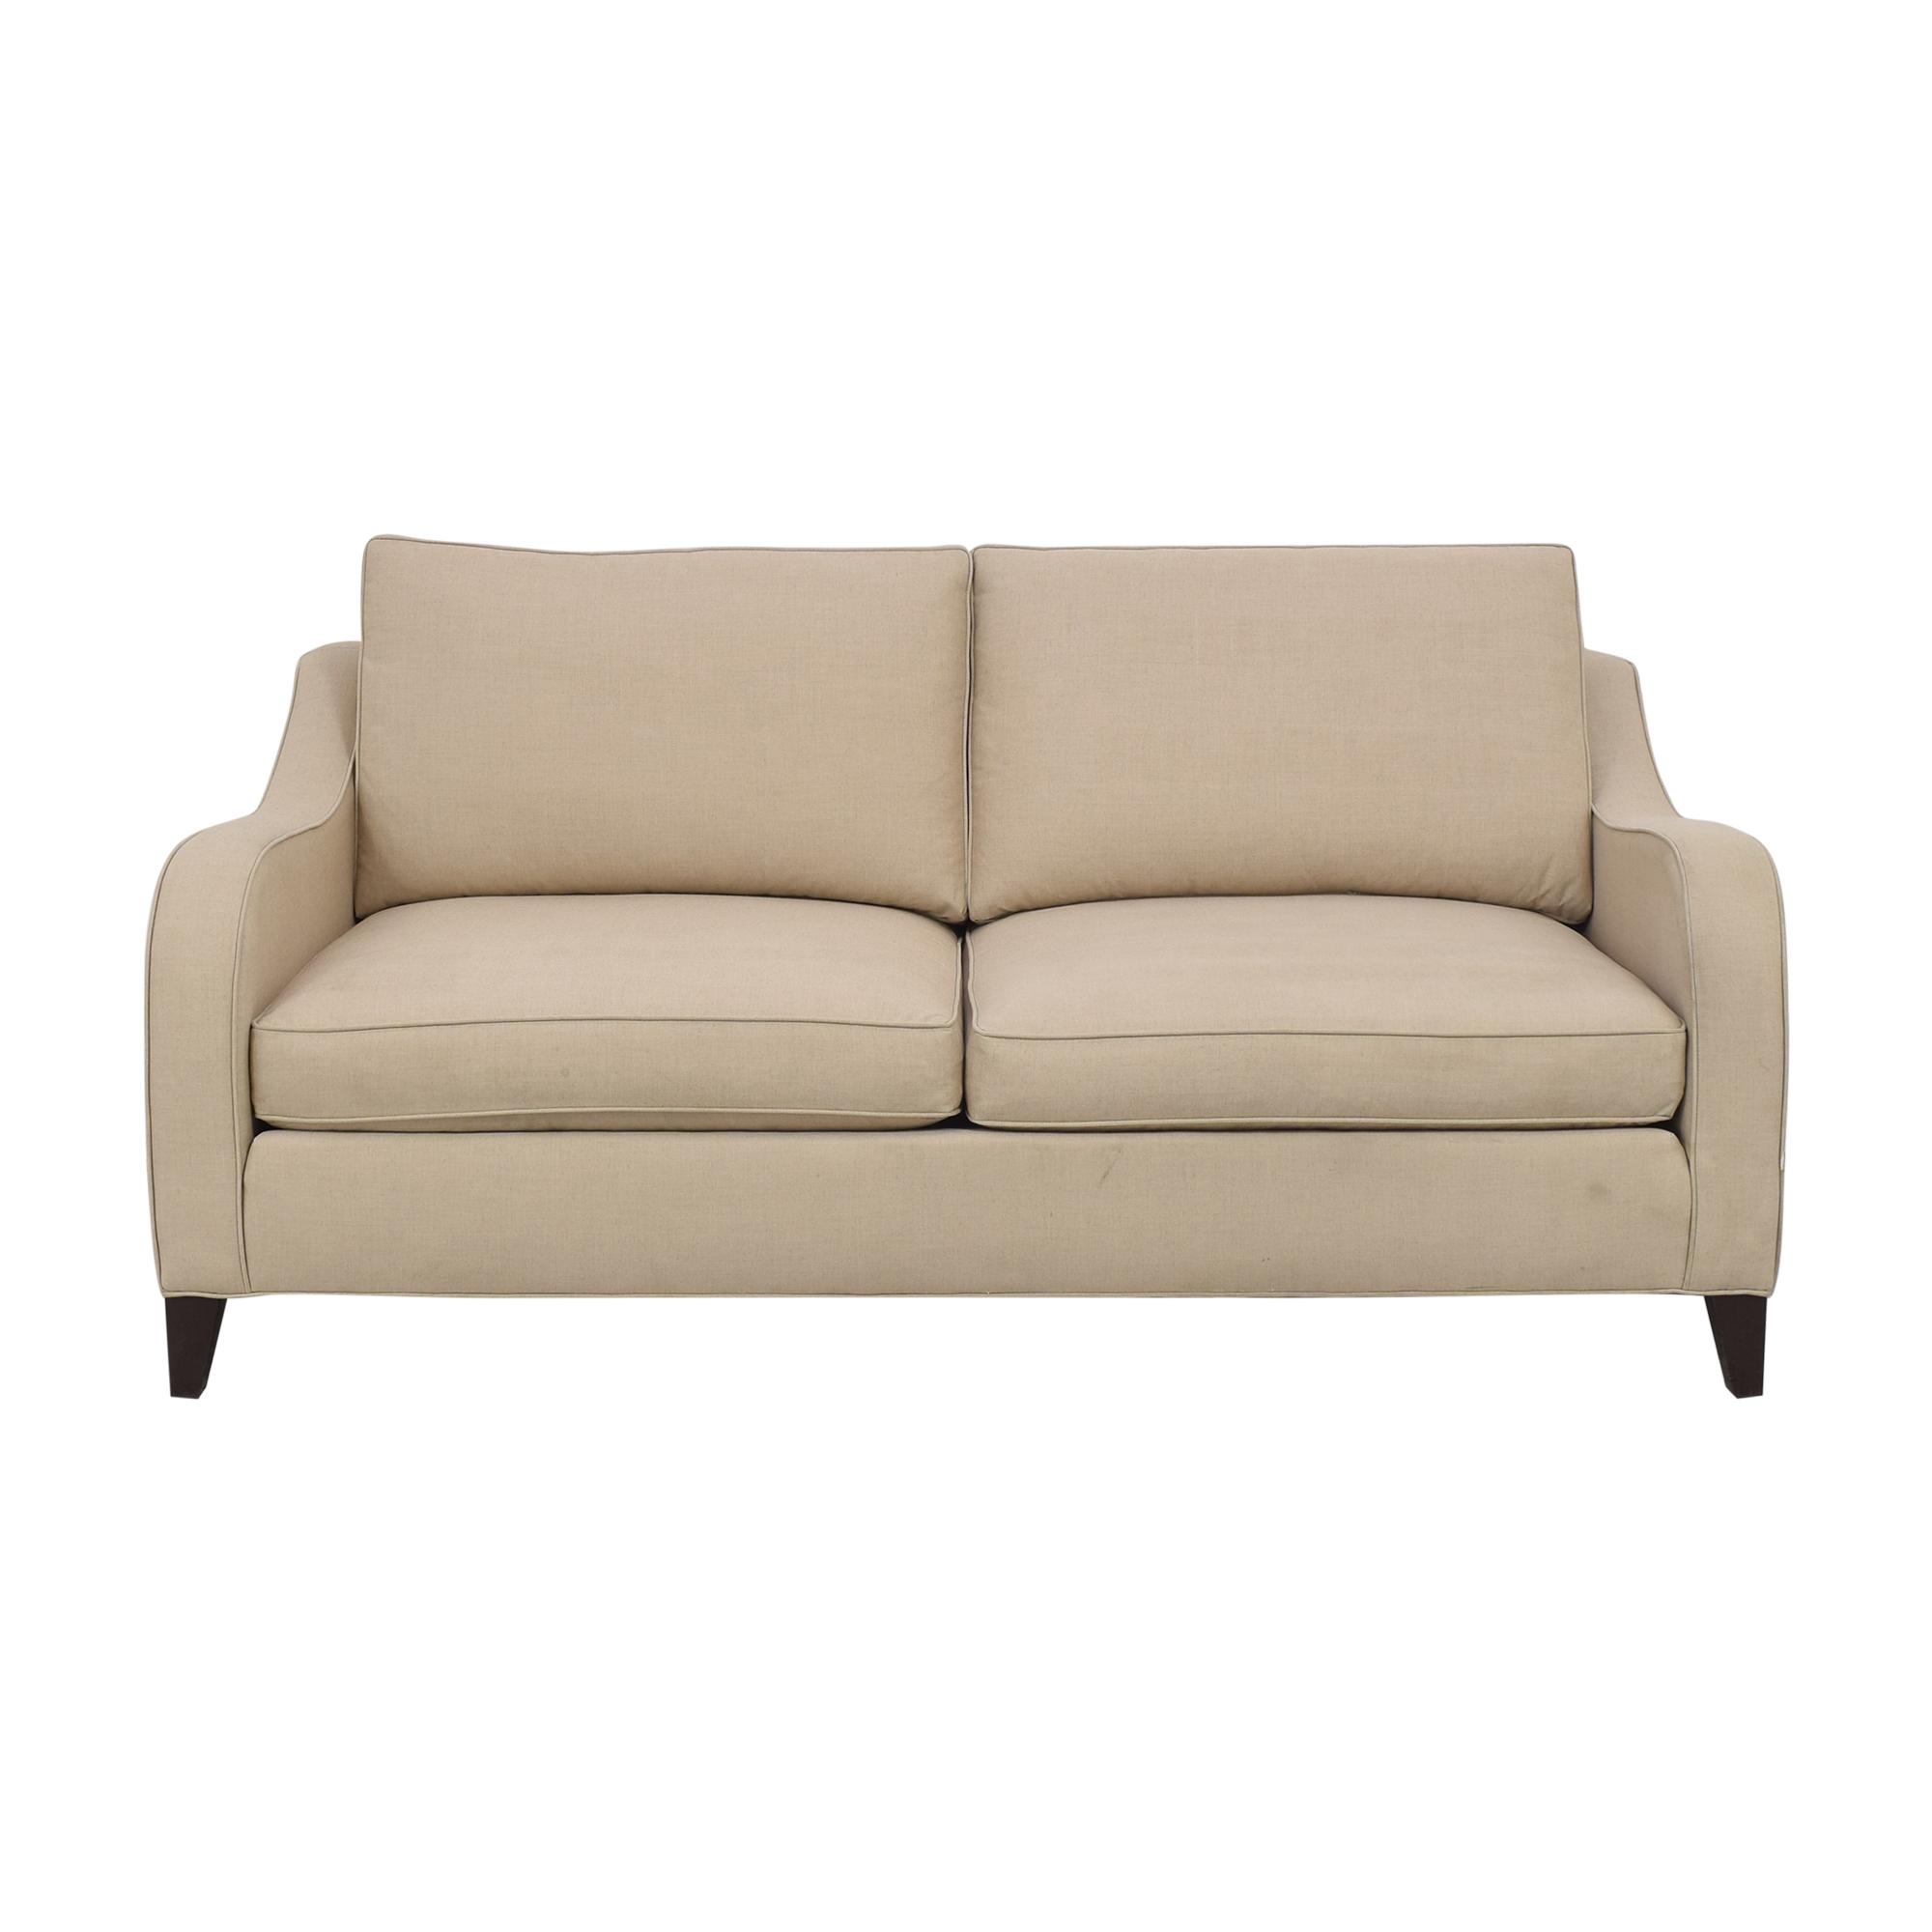 buy Ethan Allen Two Cushion Sofa Ethan Allen Classic Sofas